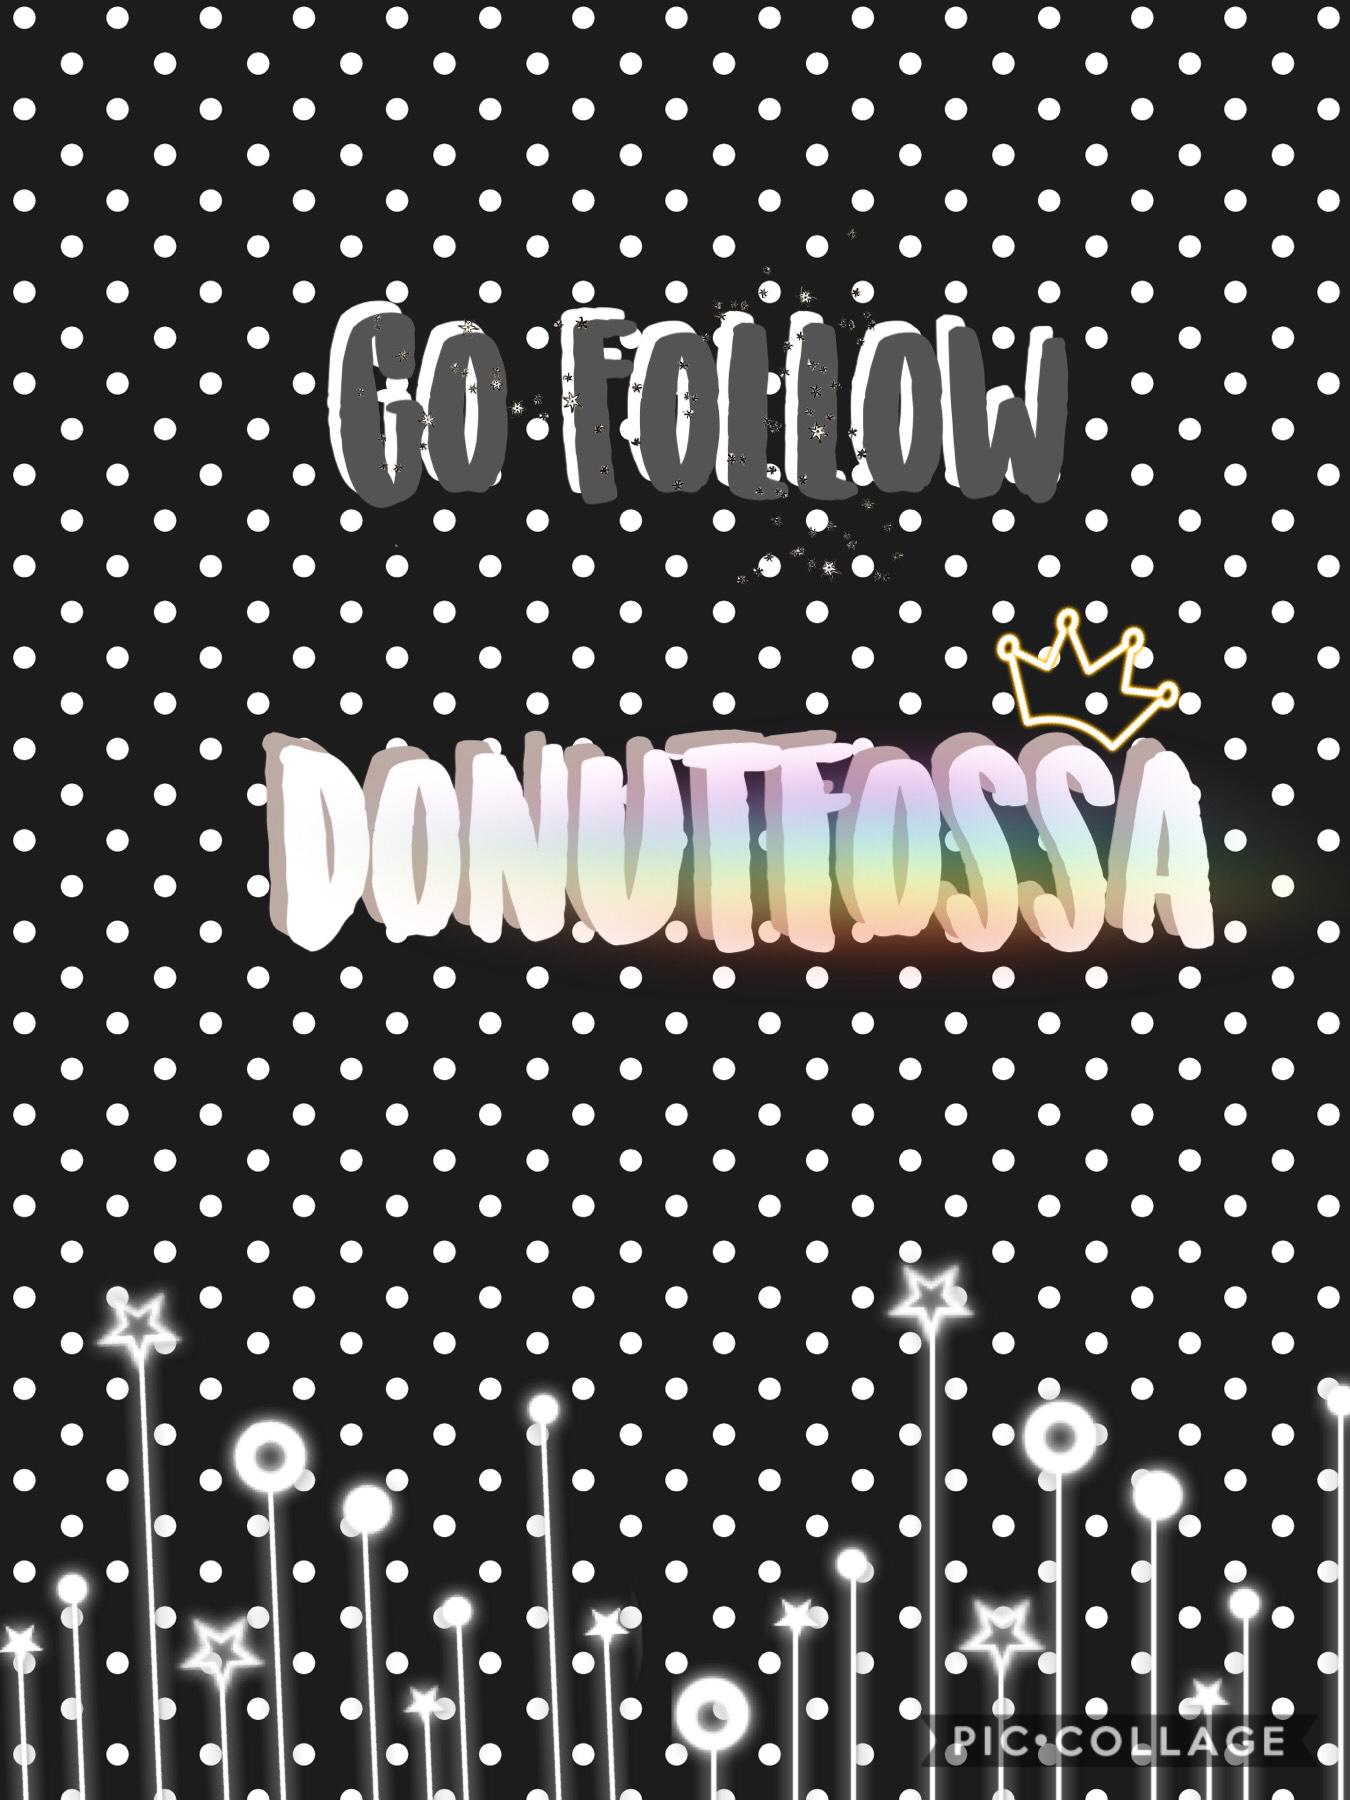 Go follow the amazing... DonutFossa